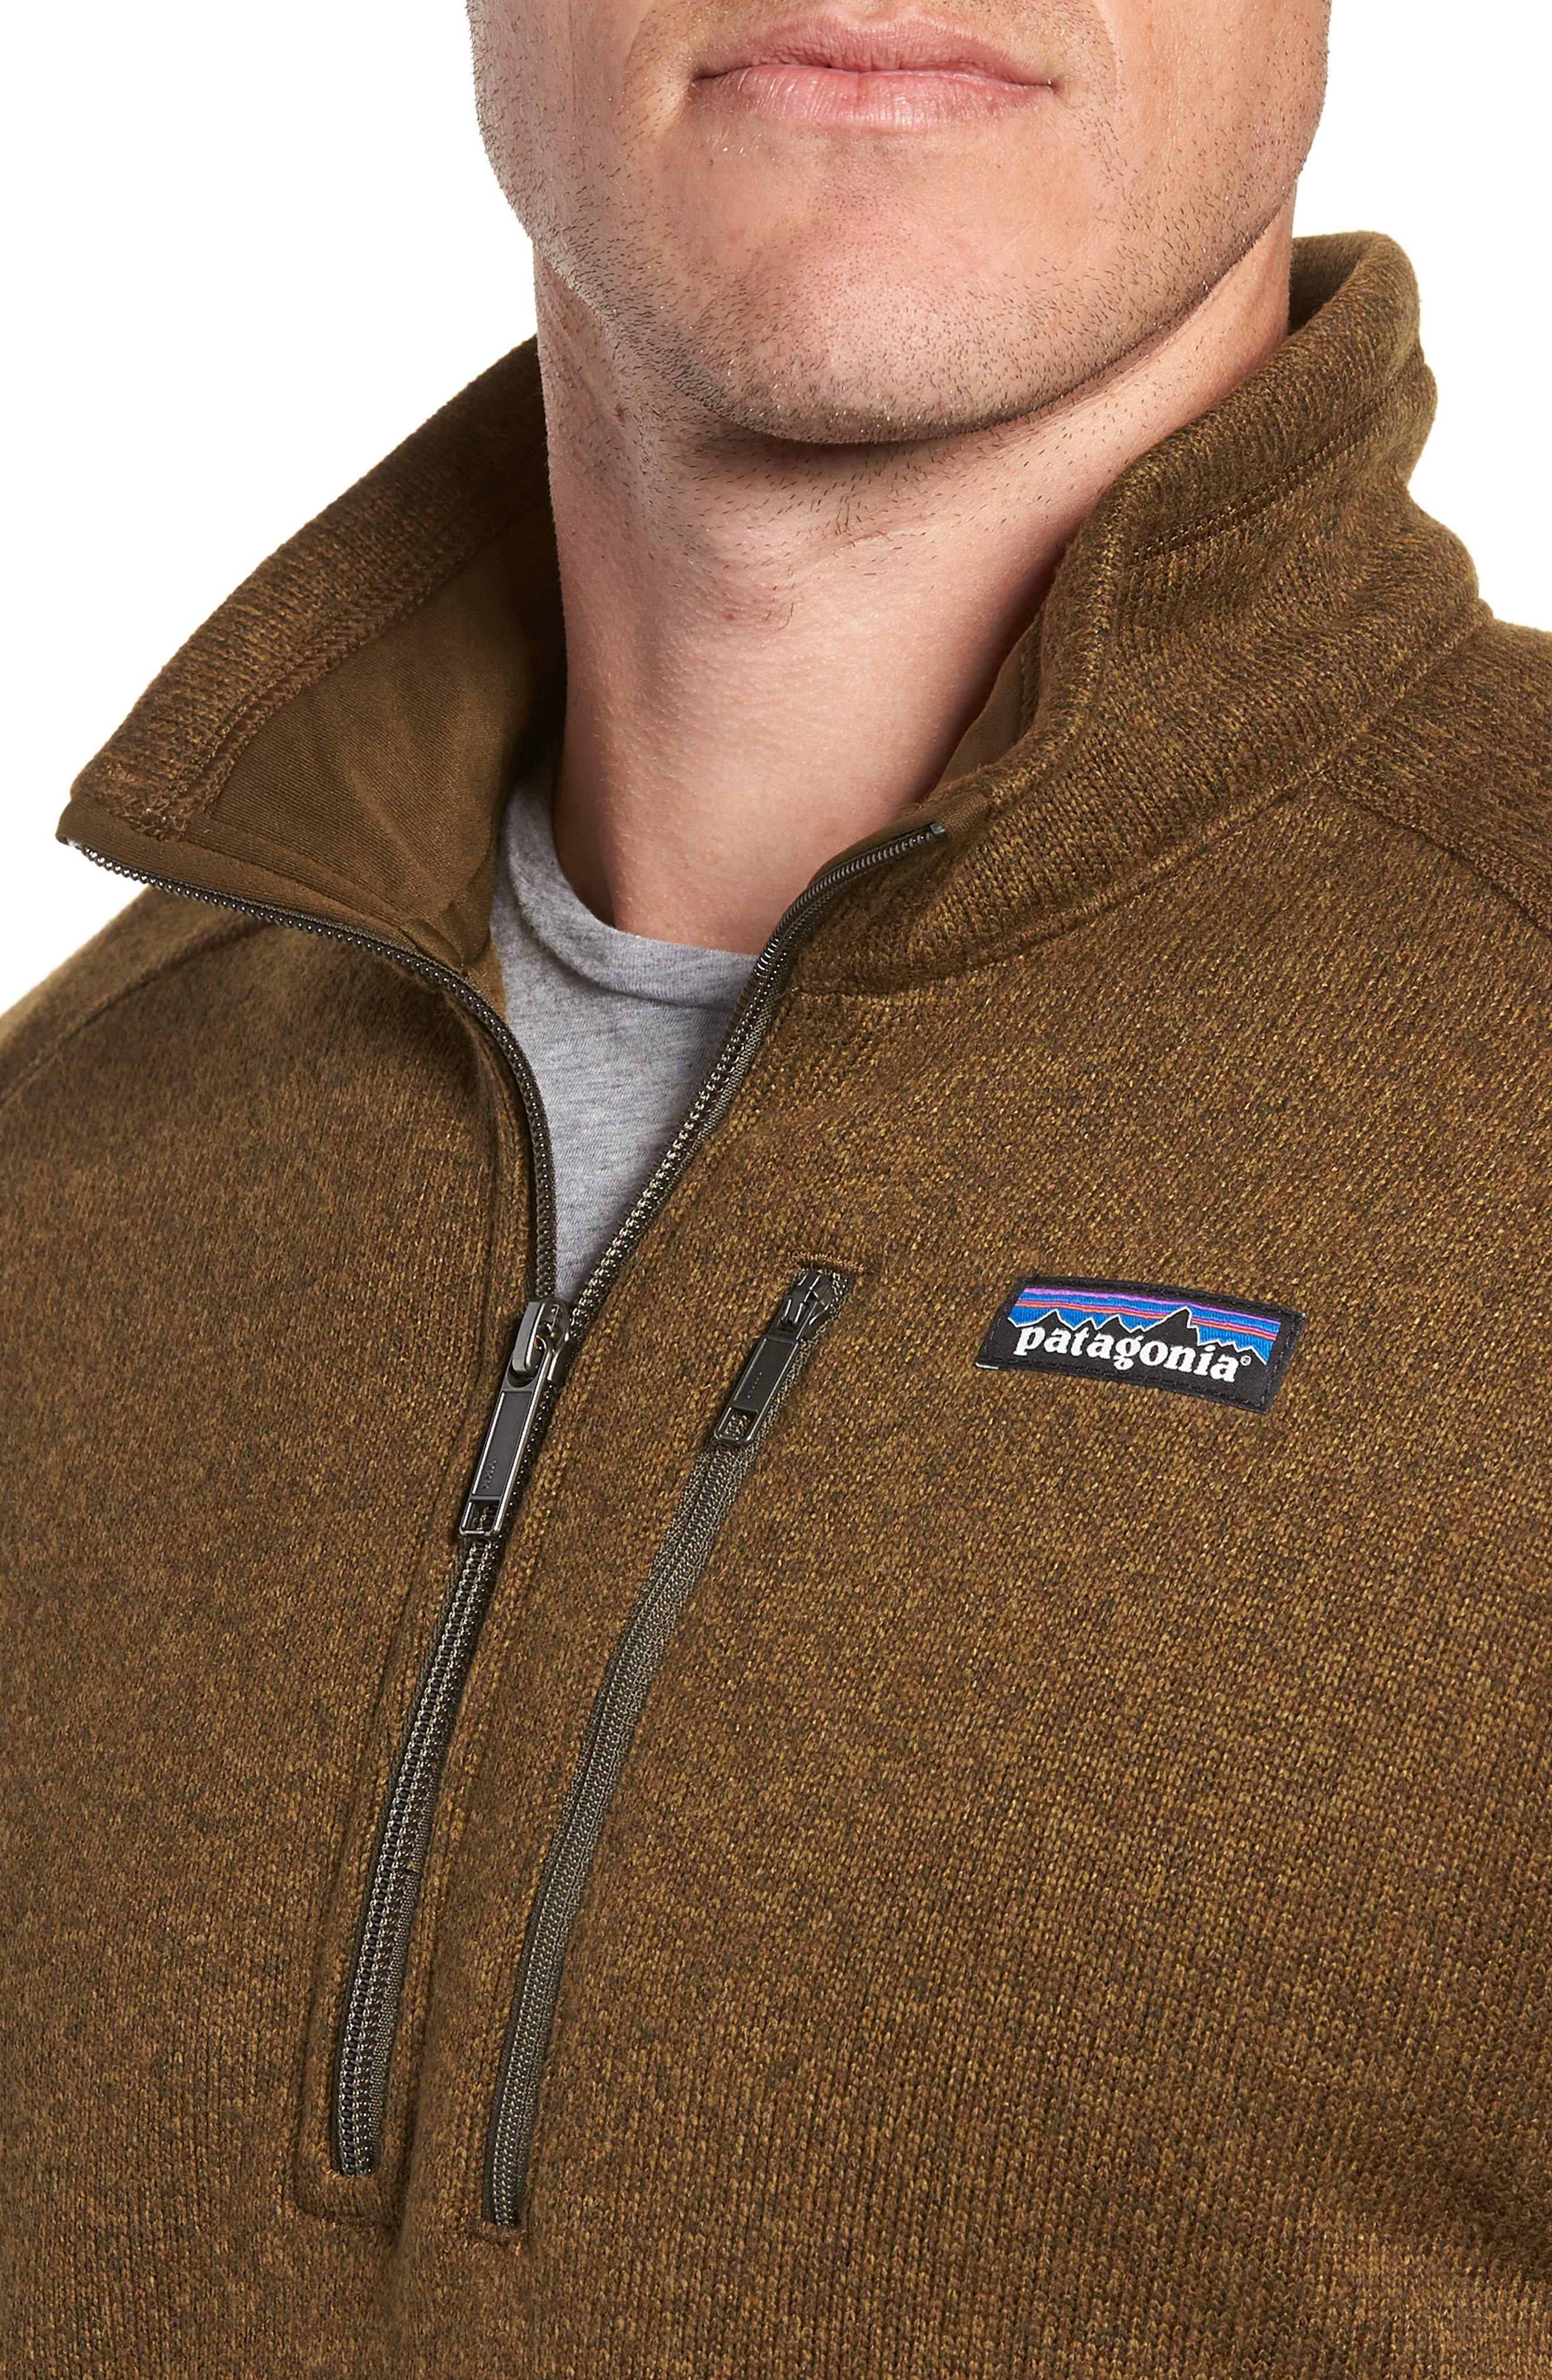 'Better Sweater' Quarter Zip Pullover,                             Alternate thumbnail 4, color,                             SEDIMENT